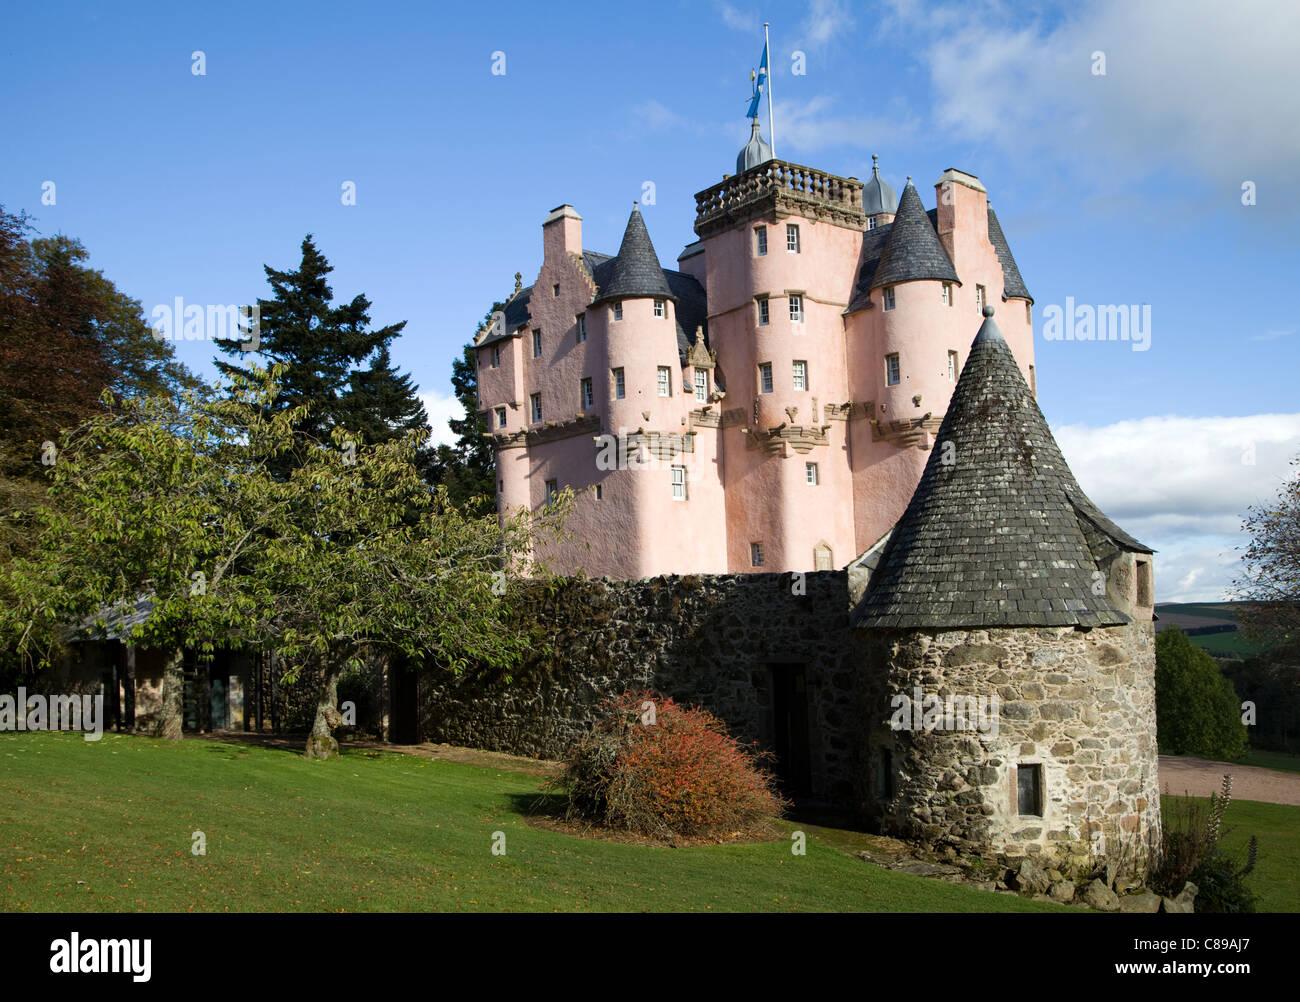 Craigievar Castle, Scotland - Stock Image